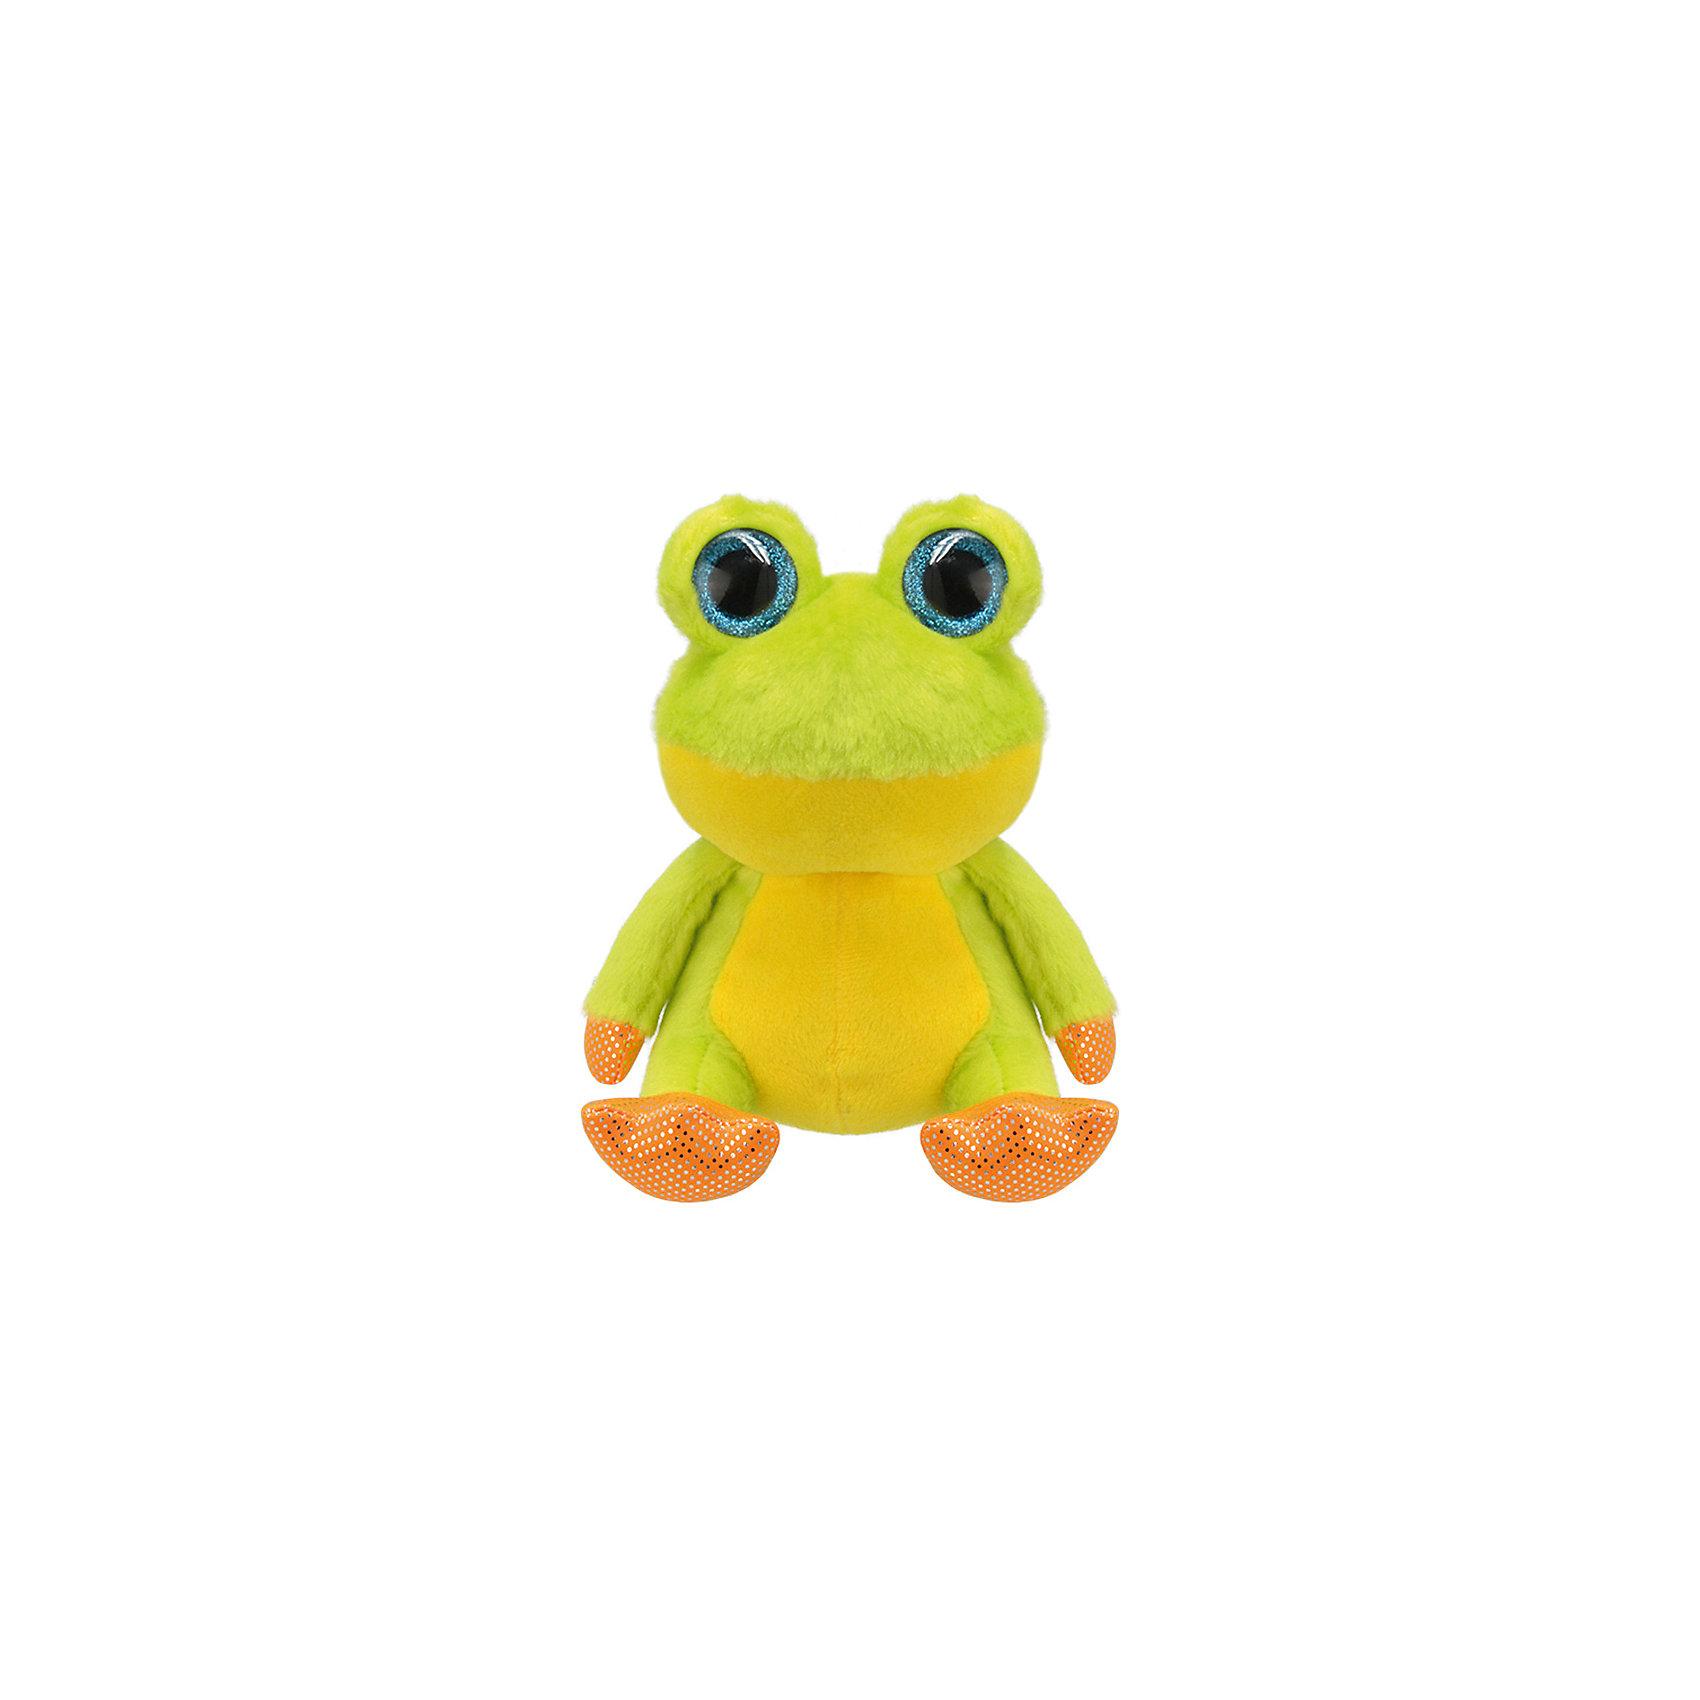 Мягкая игрушка Wild Planet Лягушонок, 15 см по цене 854